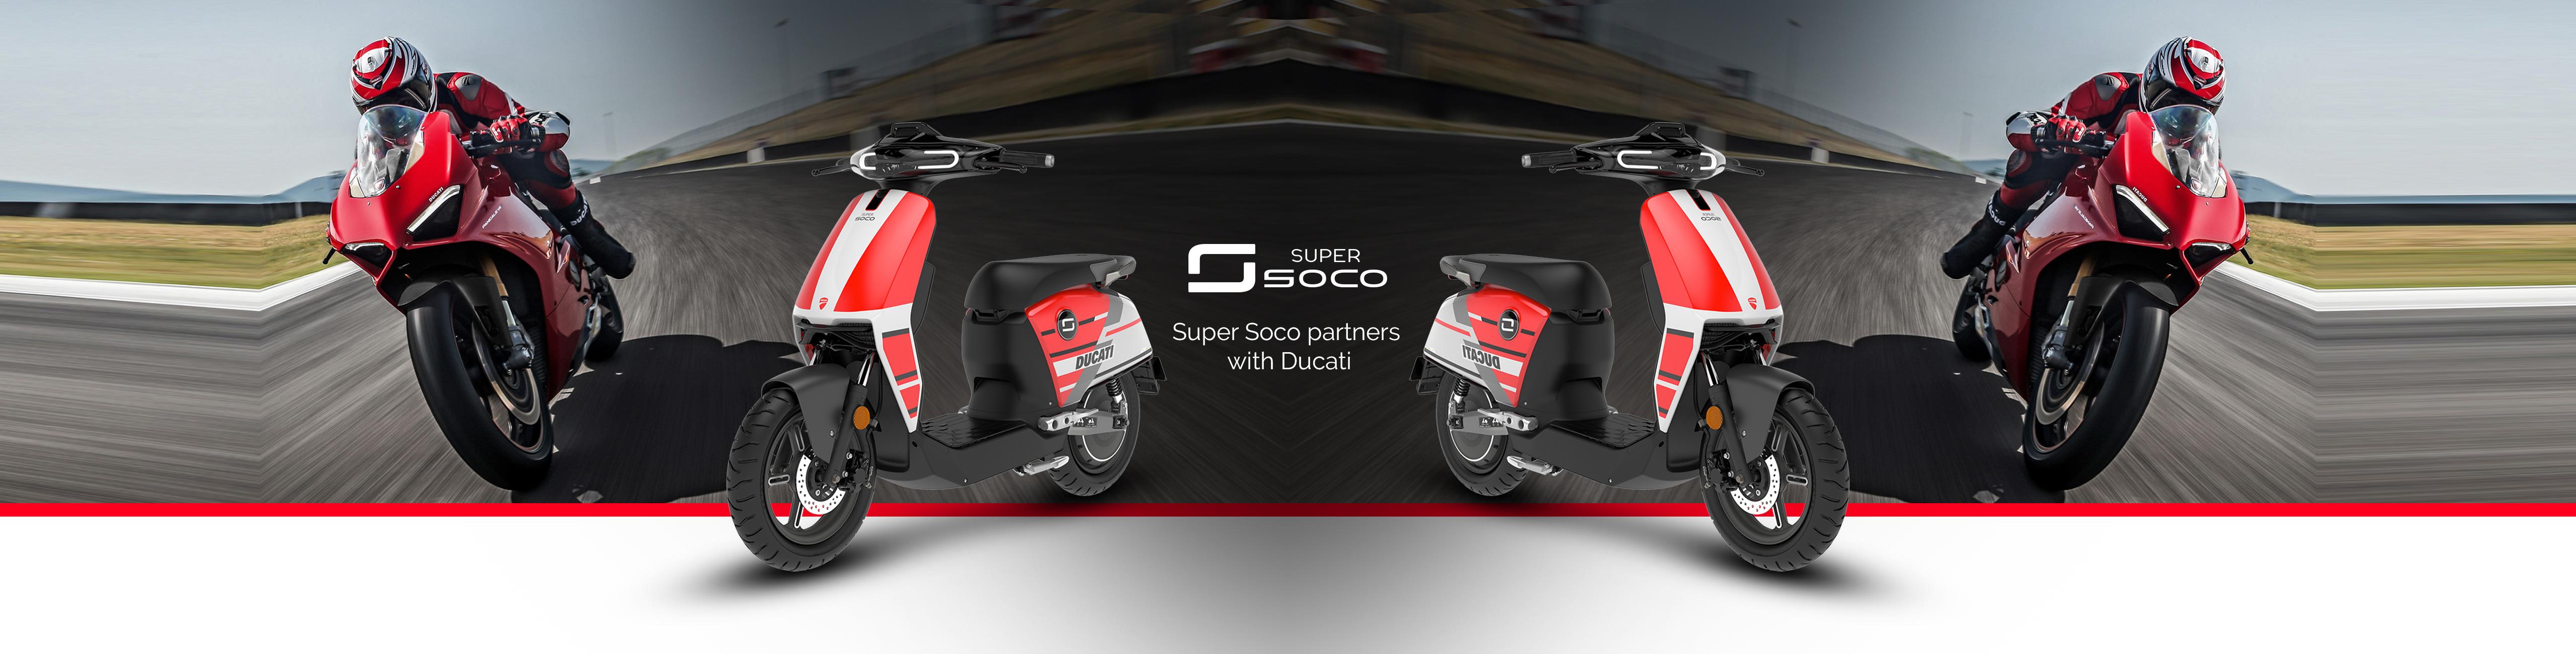 Elektroroller Super Soco CUX Ducati in Fahrt auf Strasse